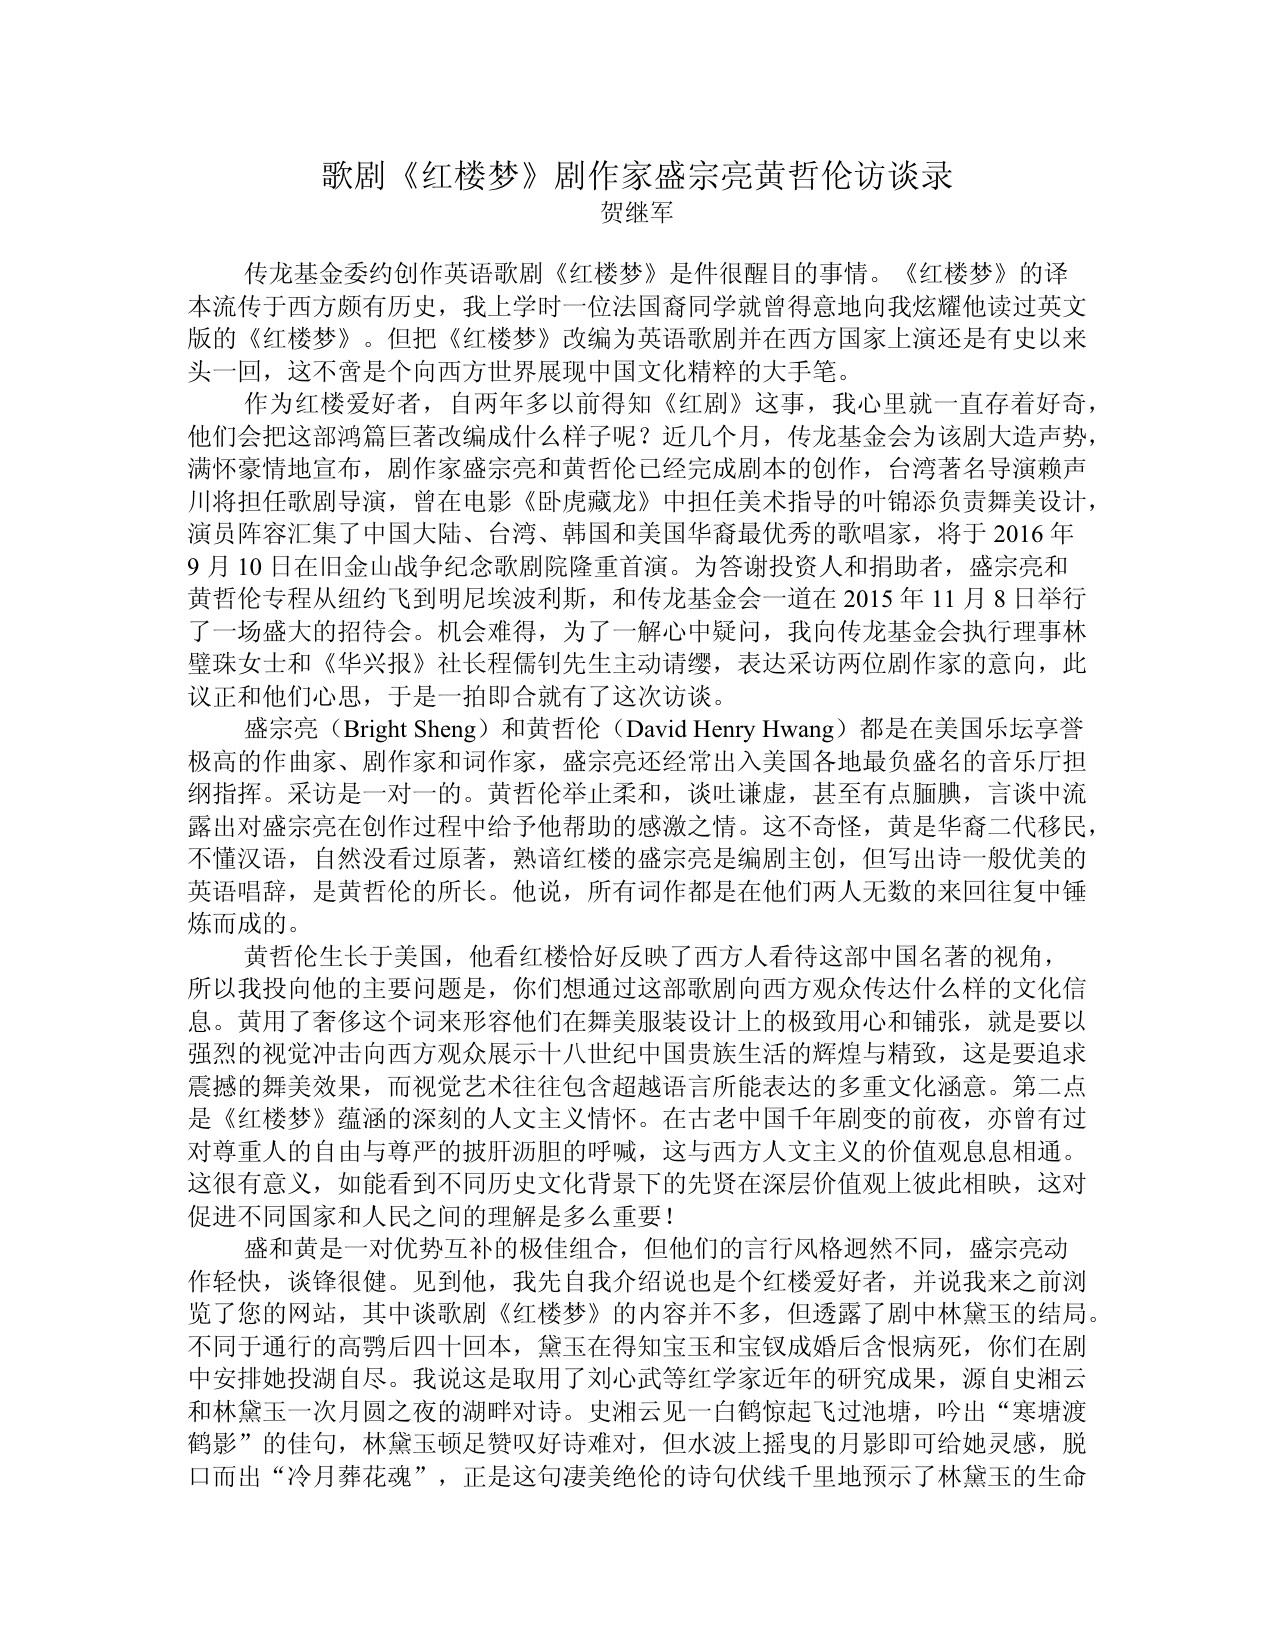 China Tribune 2016 January 7